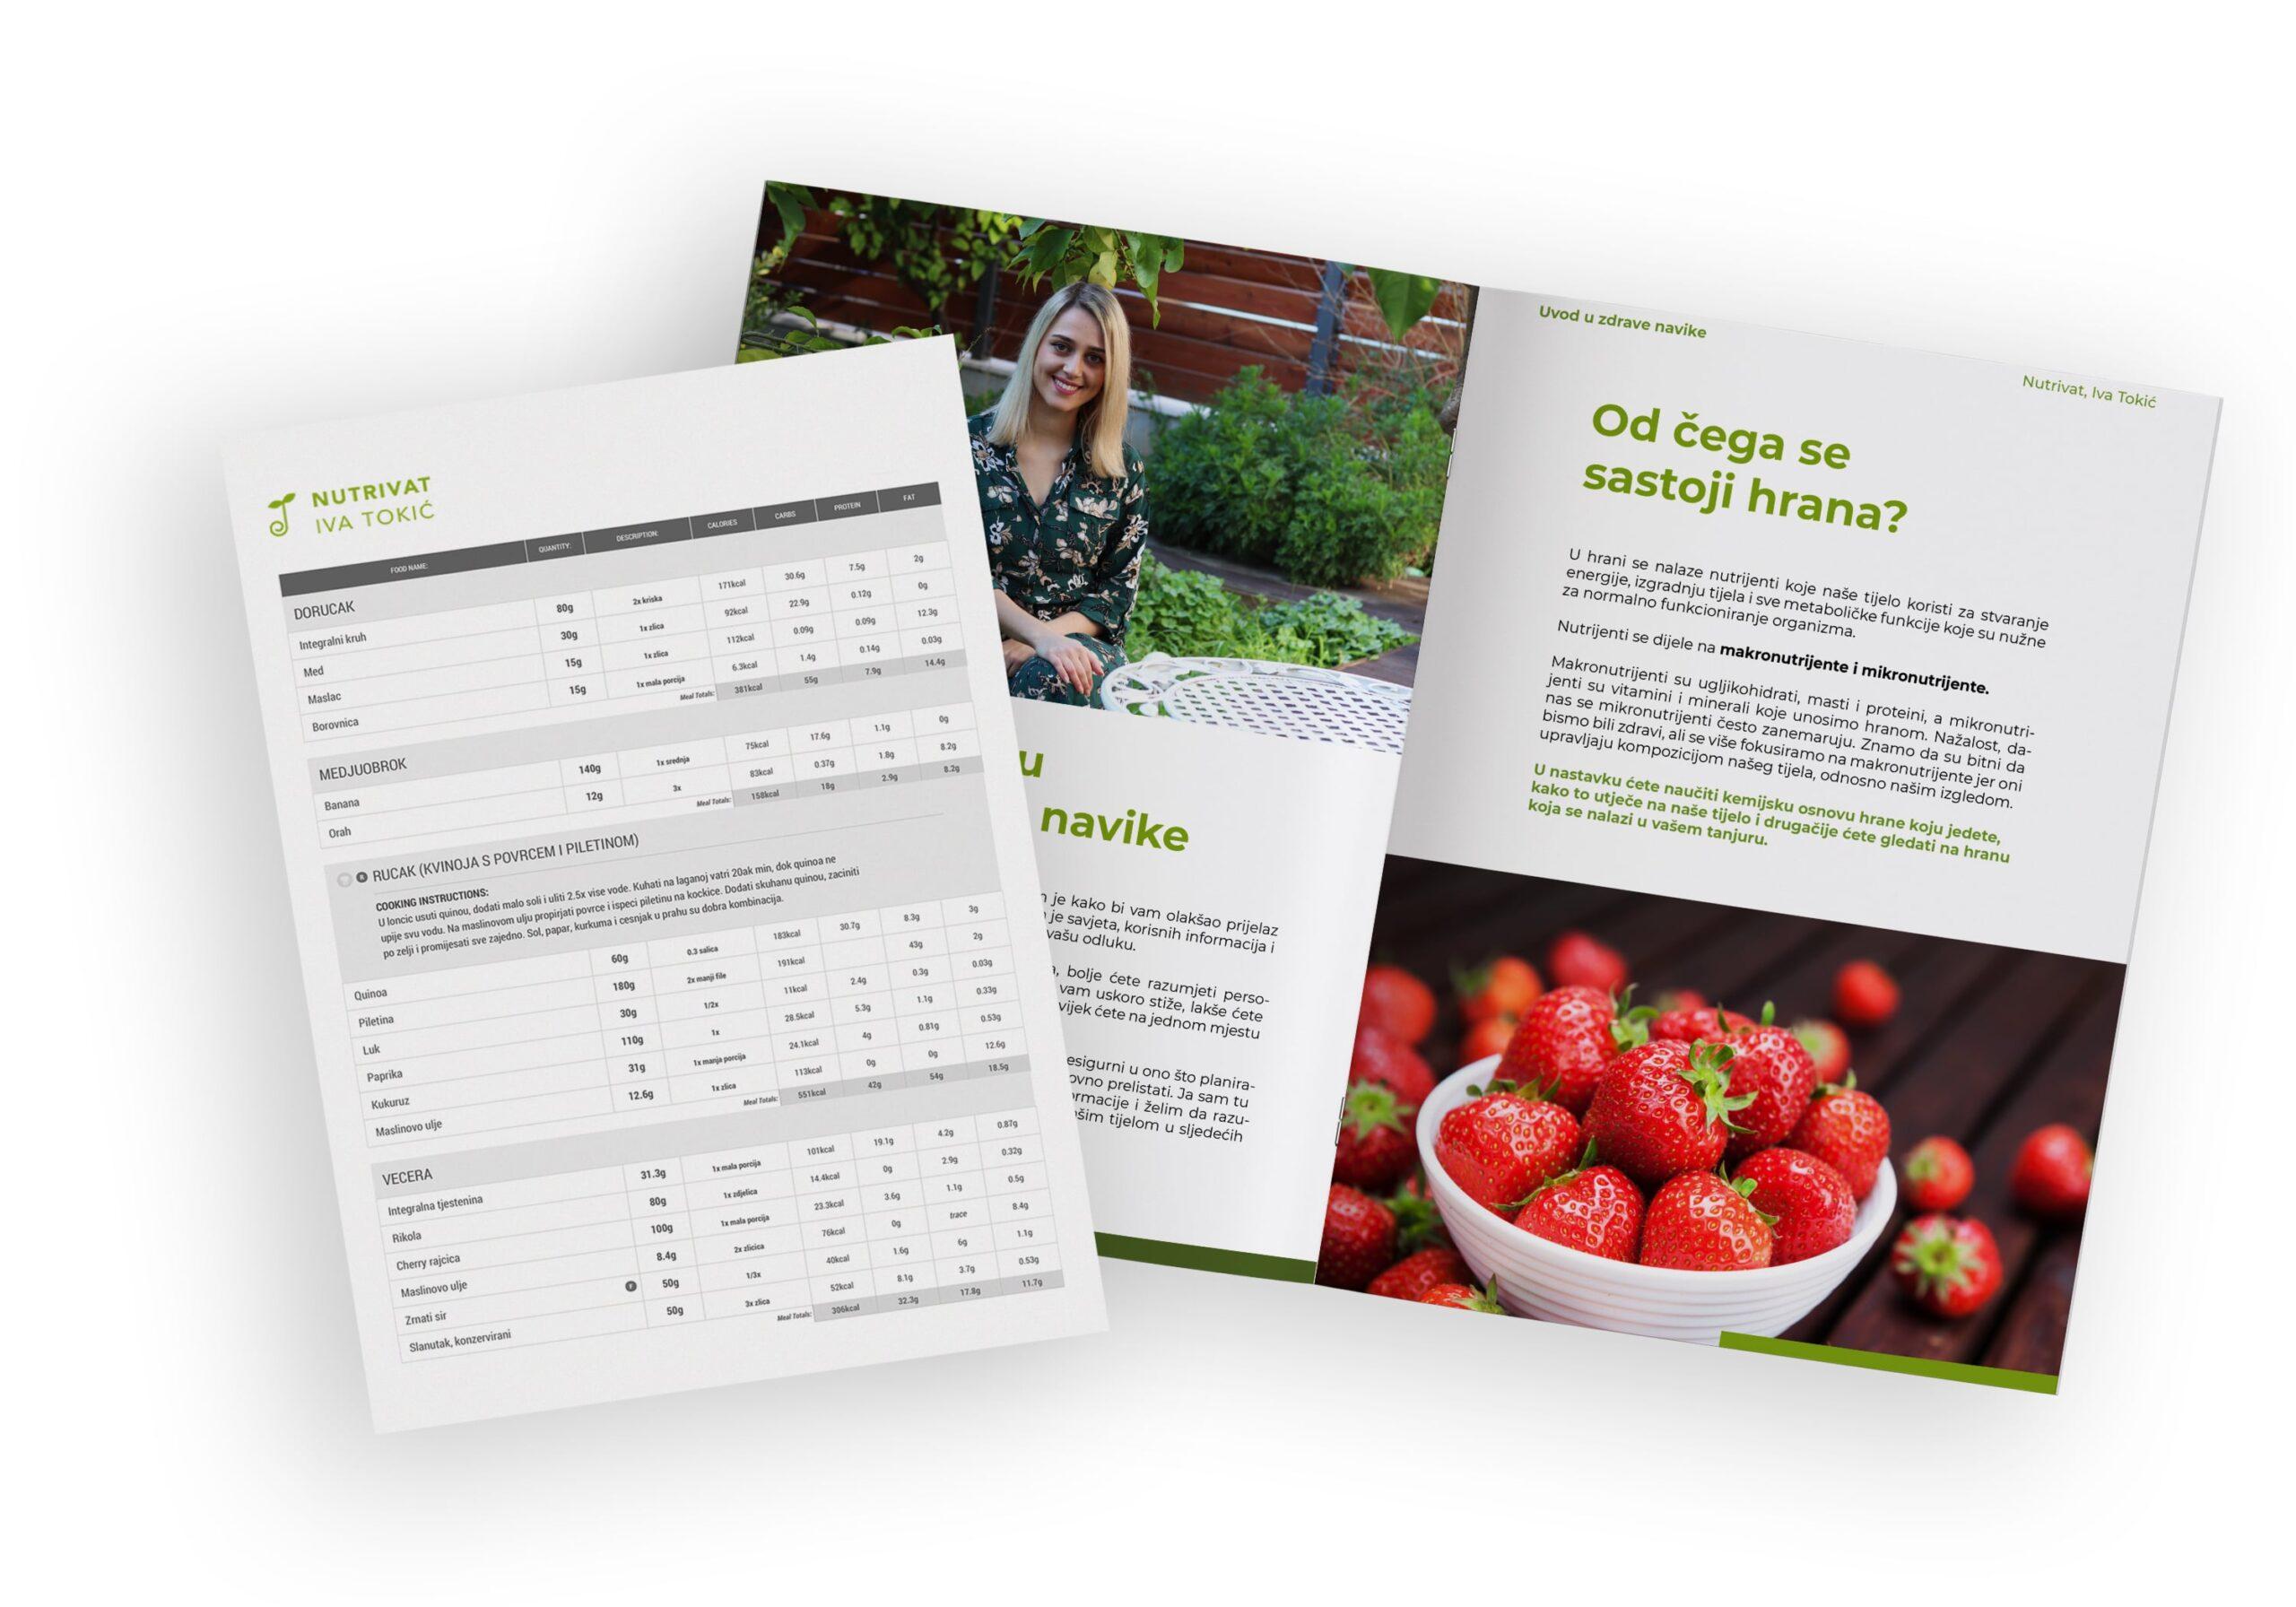 nutrivat, primjer plana prehrane, personalizirani plan prehrane